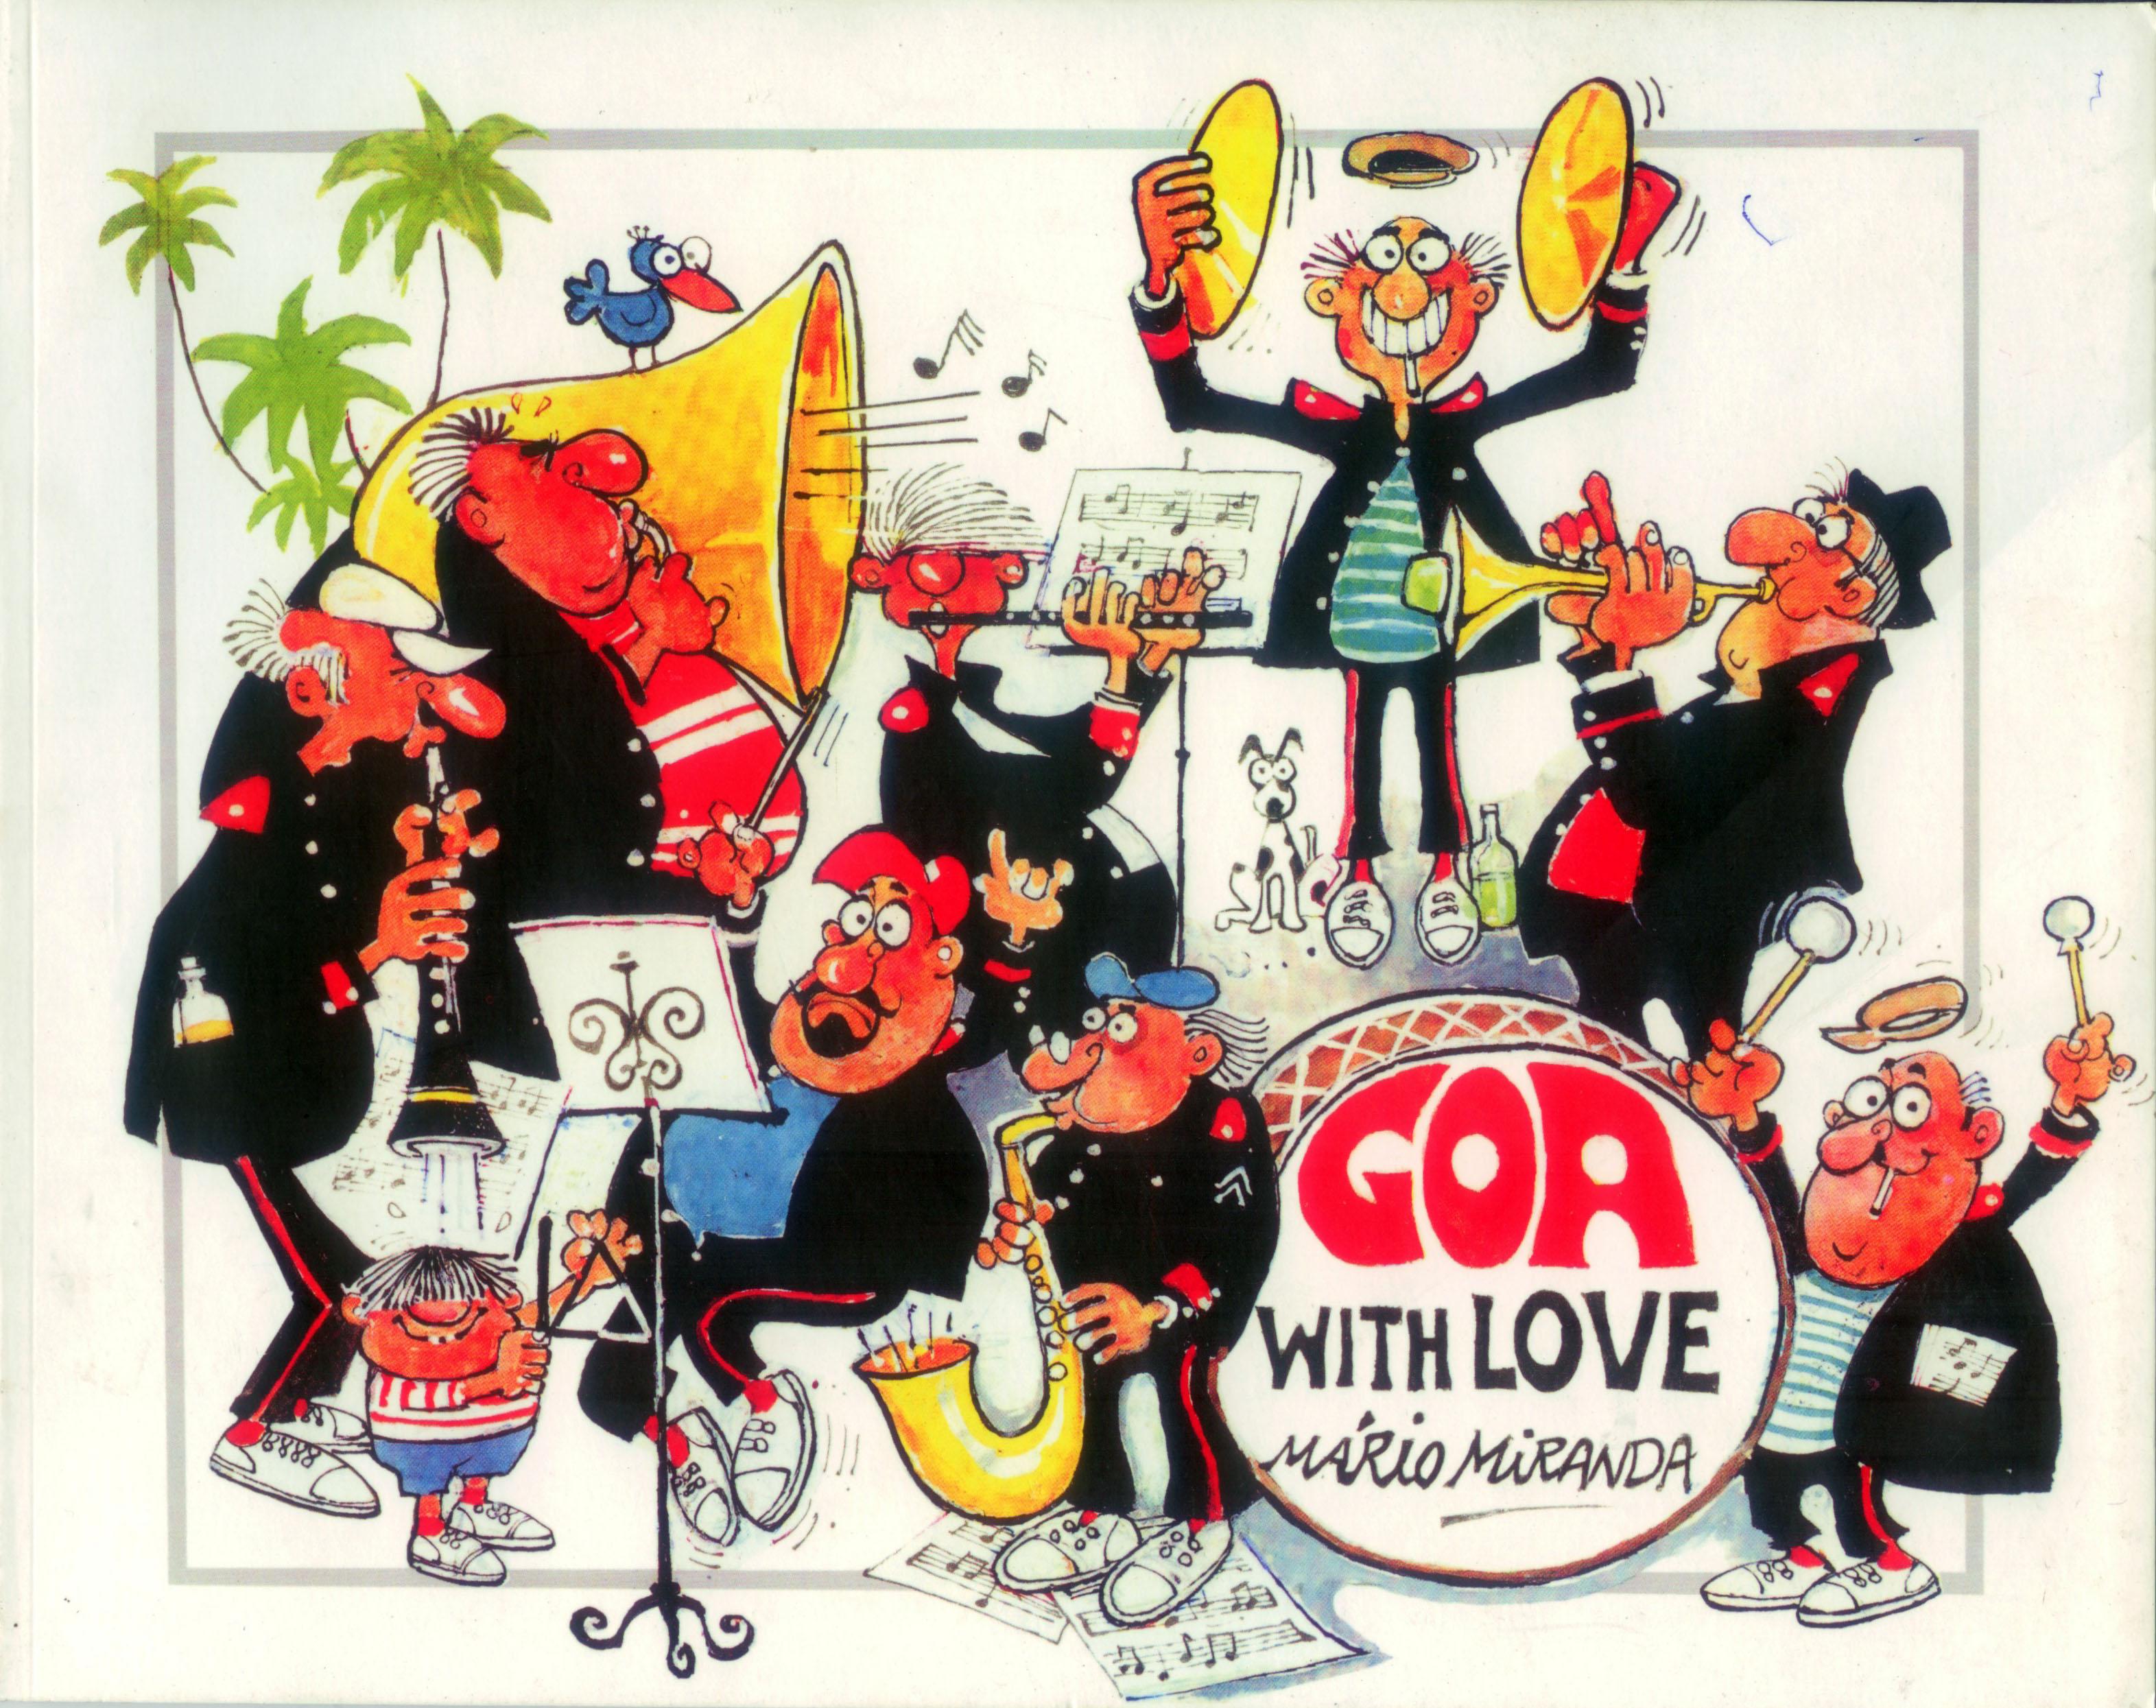 Goa, with Love